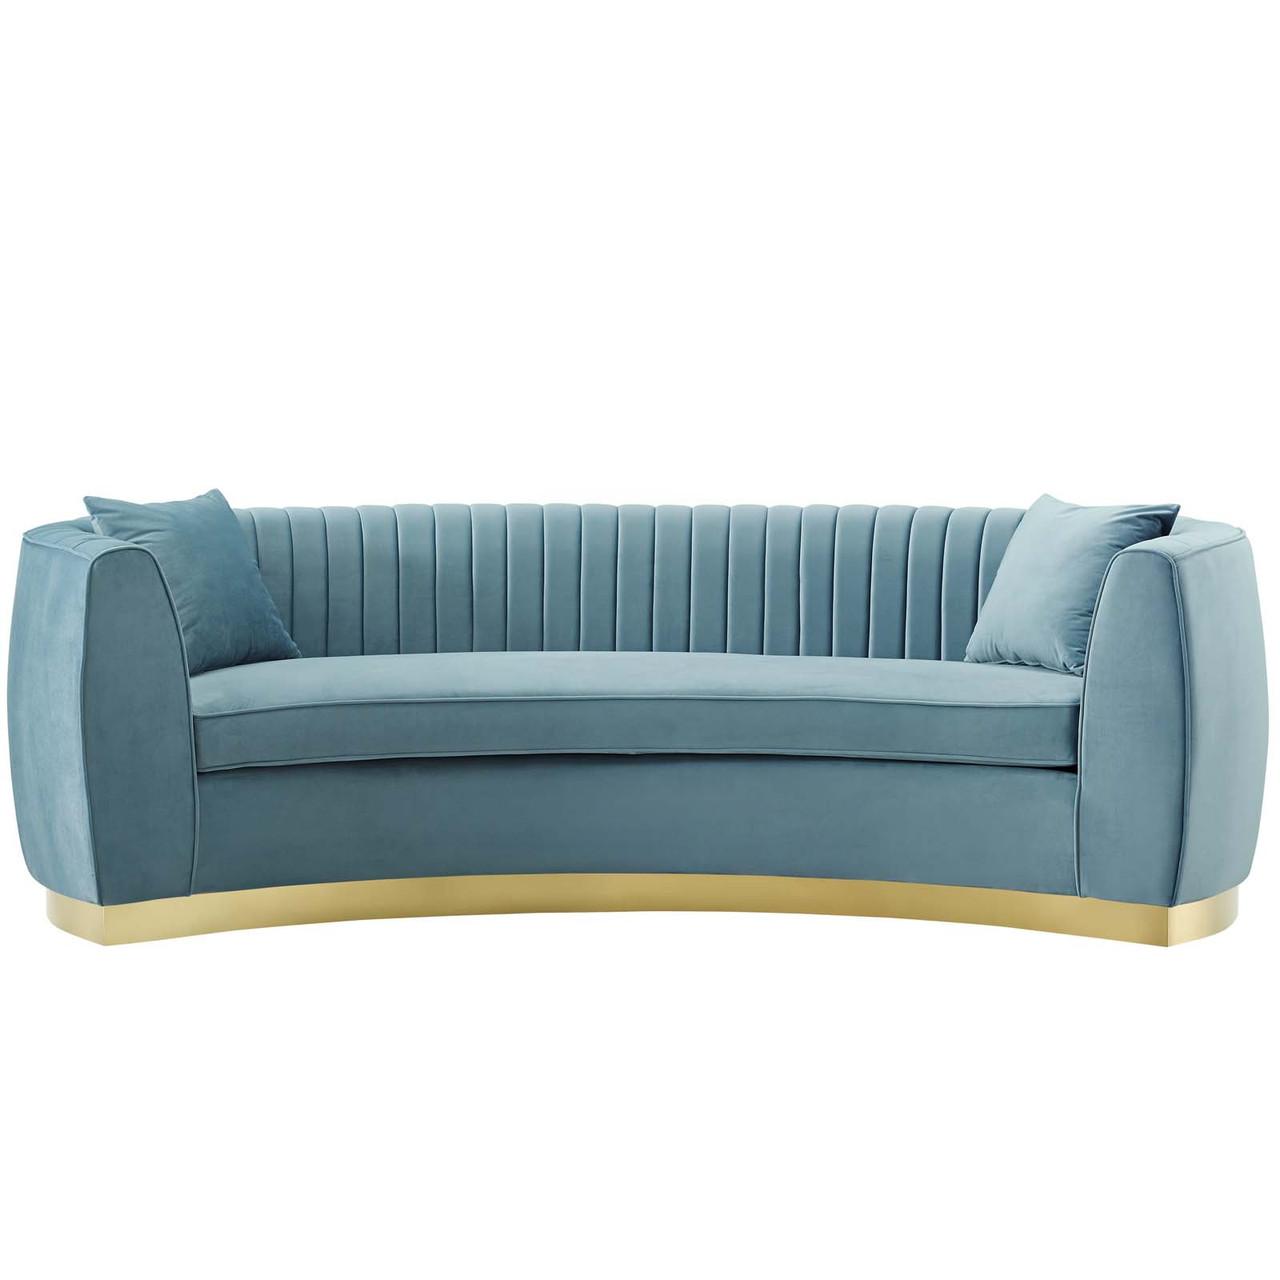 Enthusiastic Vertical Channel Tufted Curved Performance Velvet Sofa Velvet Fabric Metal Steel Light Blue 17356 House Bound